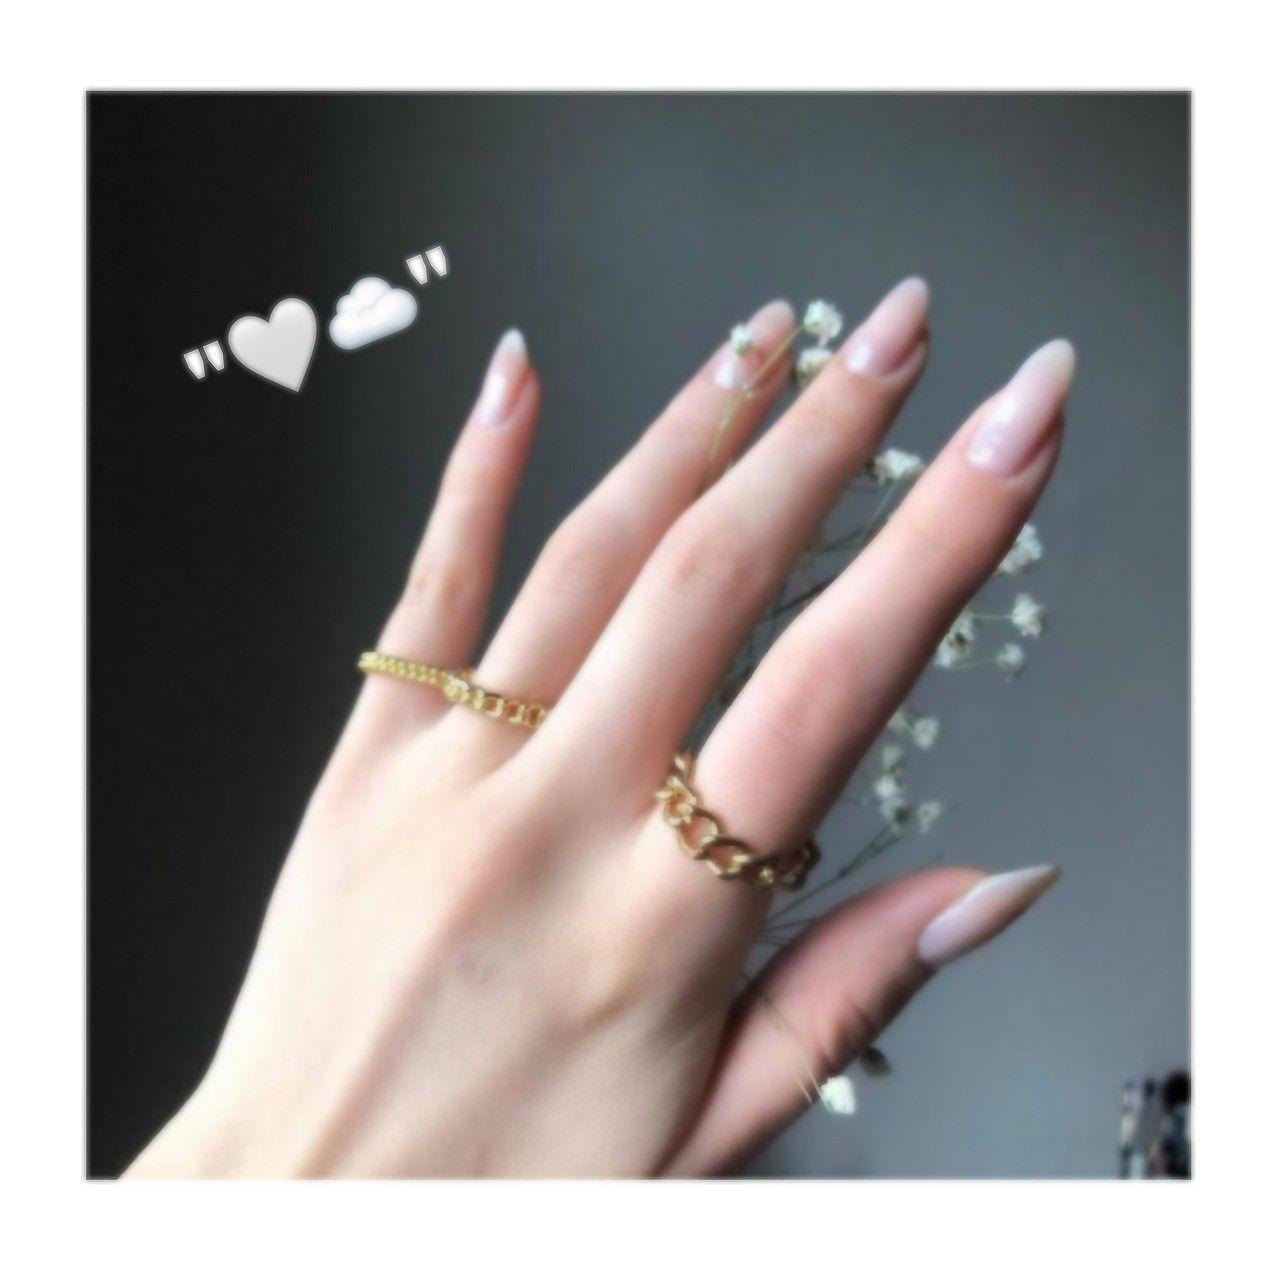 Pin By أمـ يࢪتۿۿـט On ايادي بنات كيوت Photo Ideas Girl Nails Arabian Art